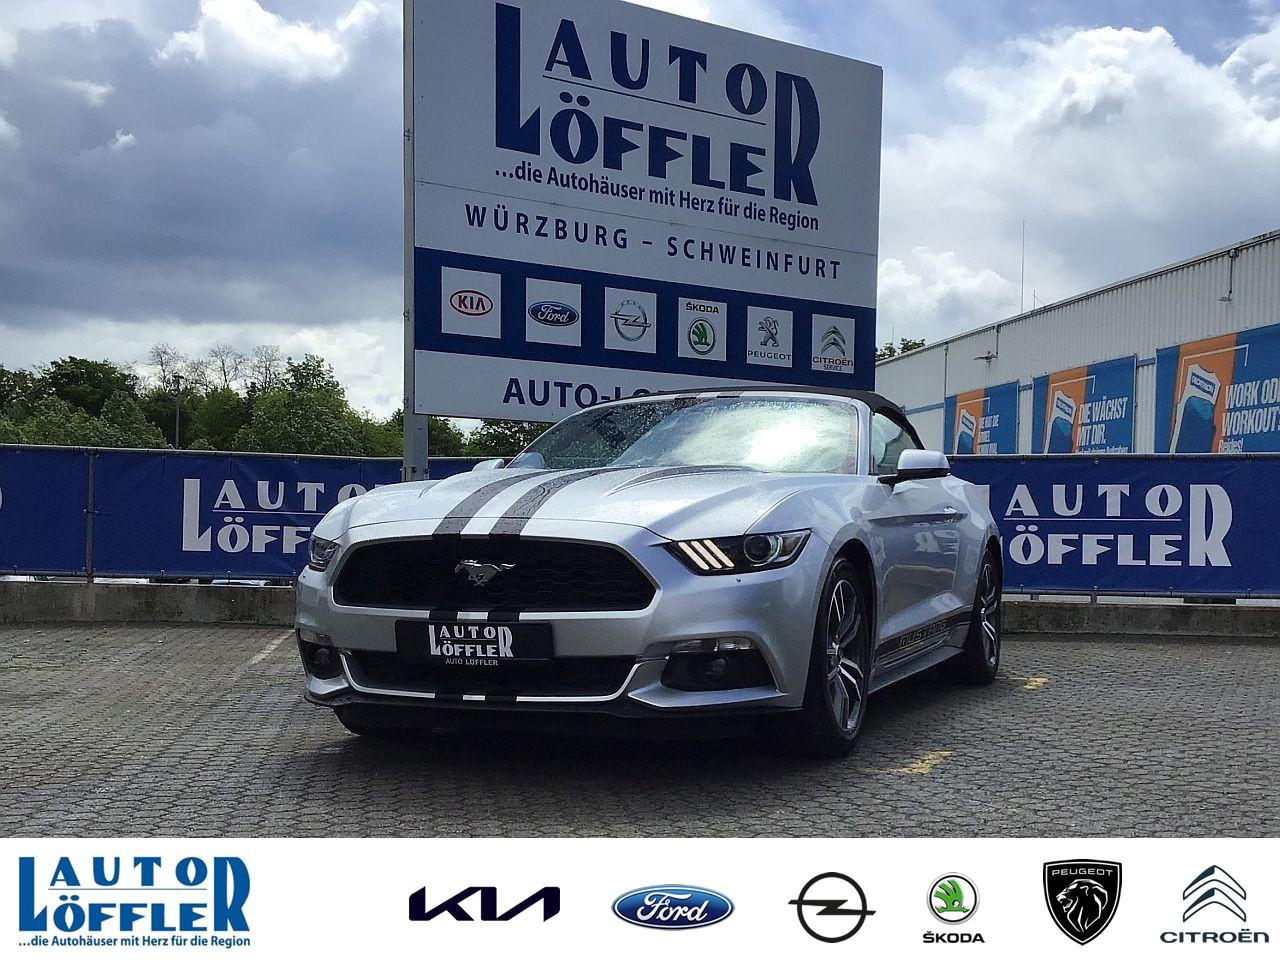 Ford Mustang 2.3 l Convertible - Navi RFK Automatik, Jahr 2017, Benzin